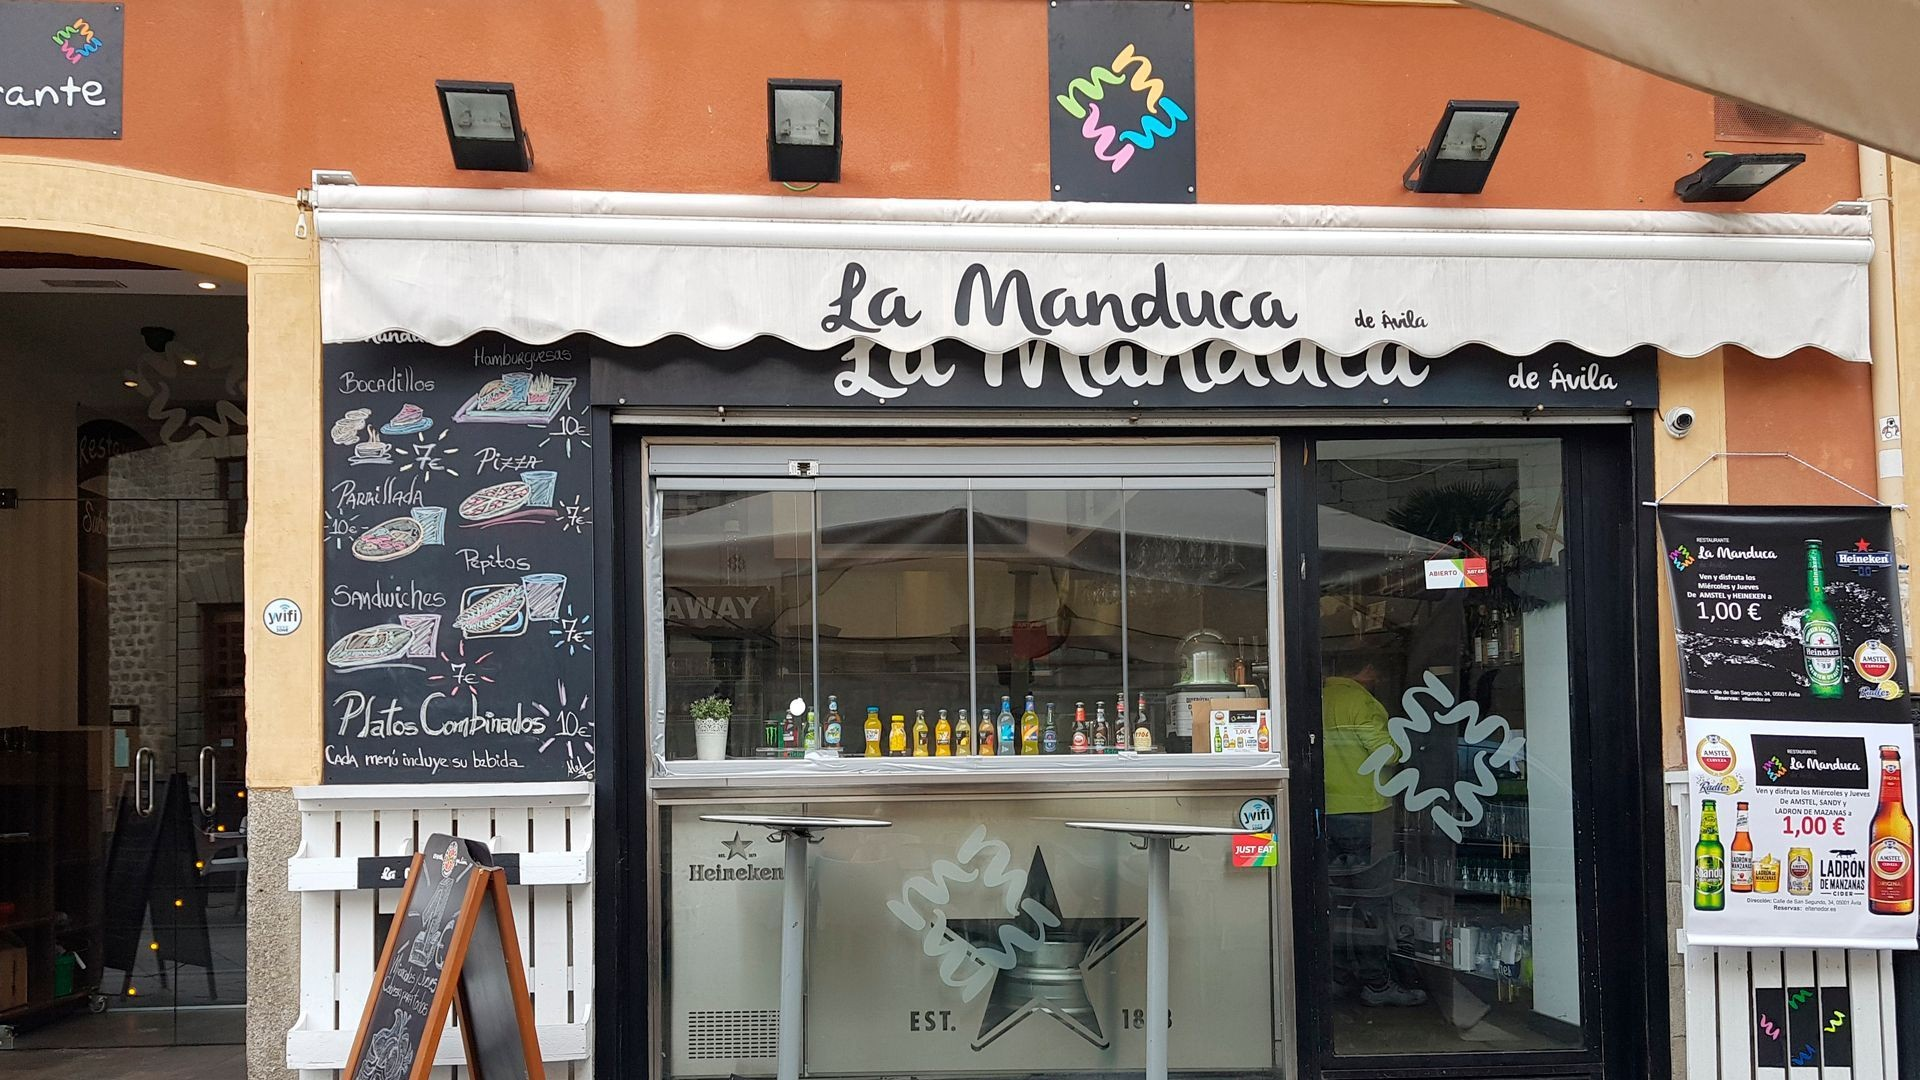 Restaurante de cocina abulense y venezolana en Ávila